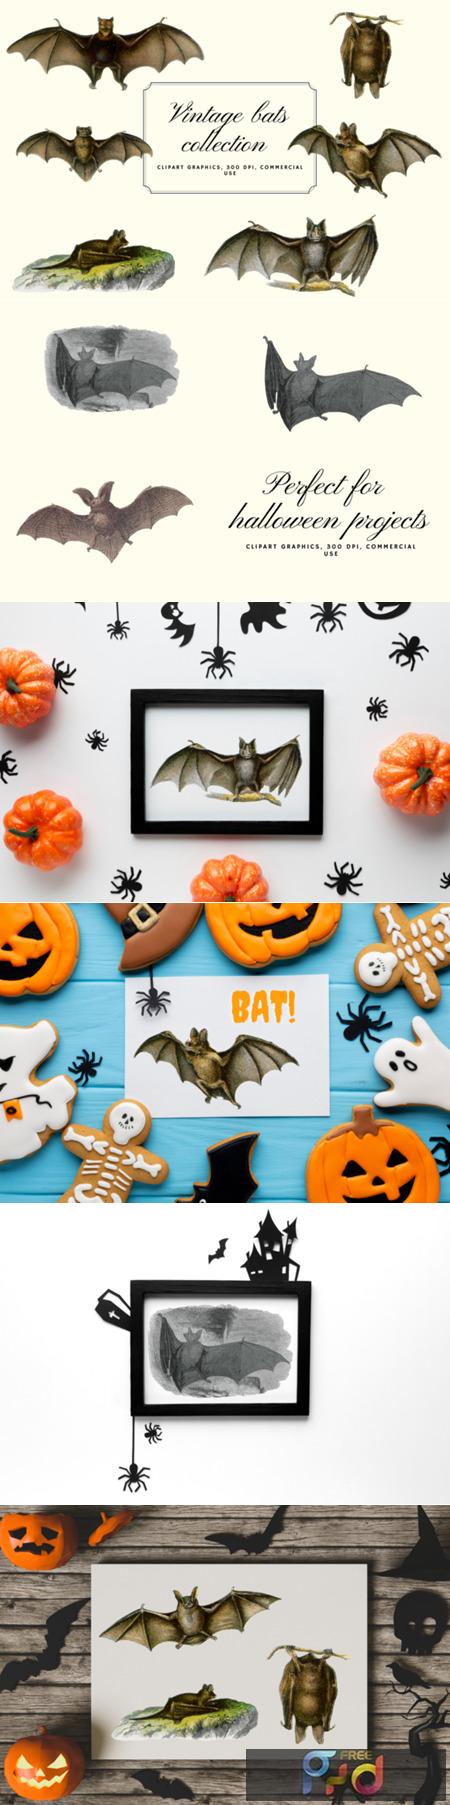 Vintage Bats Collection, Creepy Graphics 5919304 1